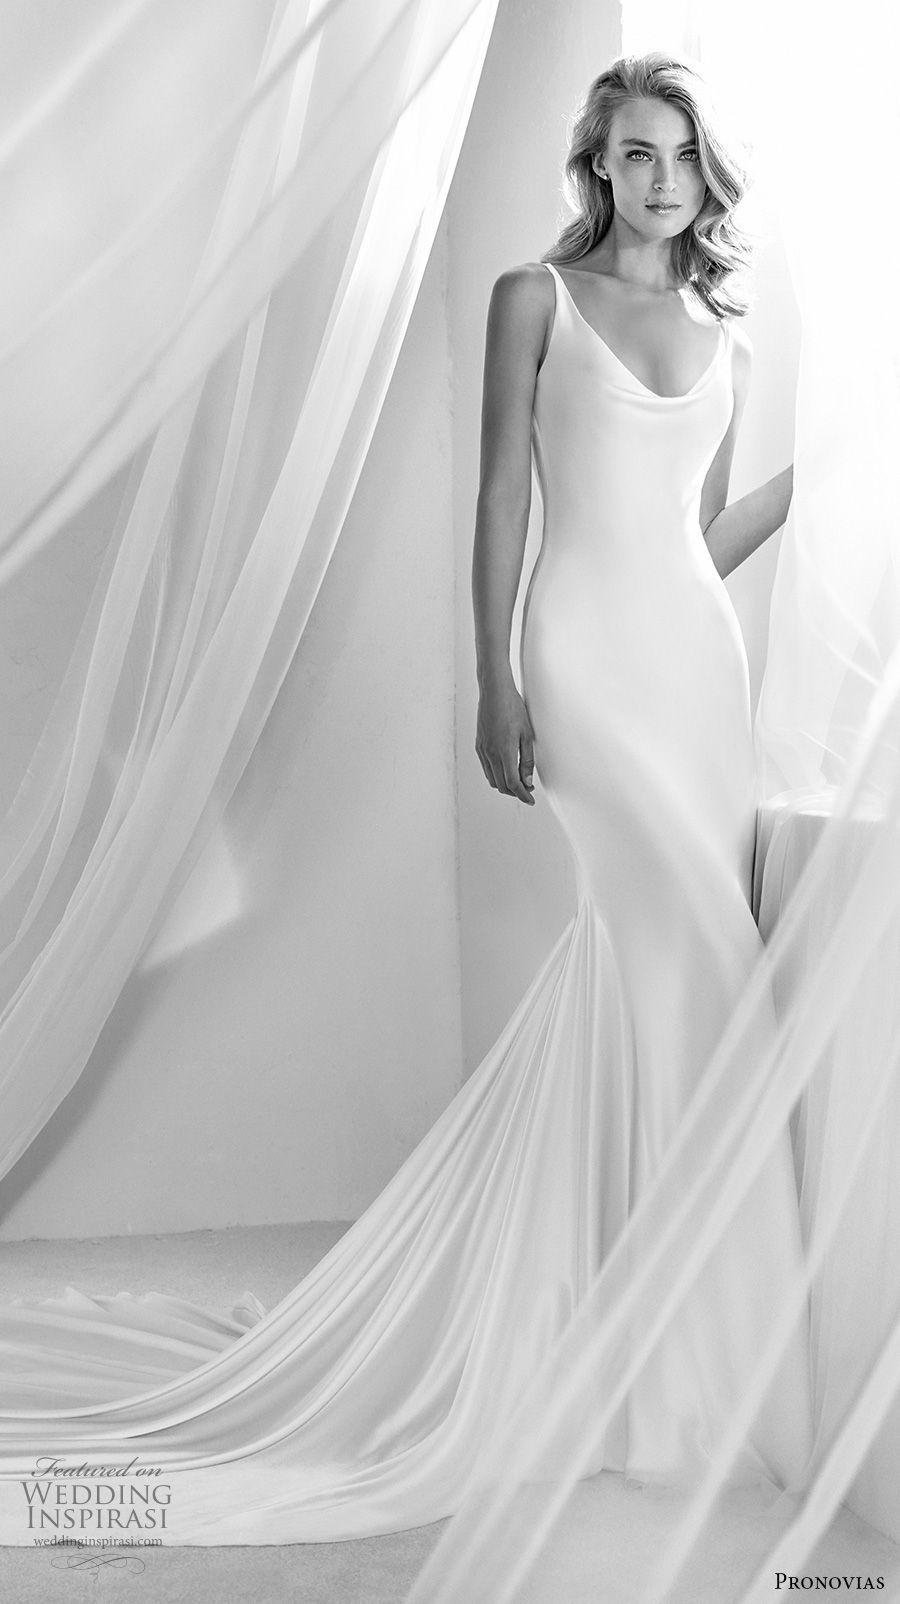 Elegant fitted wedding dresses  Atelier Pronovias  Wedding Dresses  Atelier pronovias